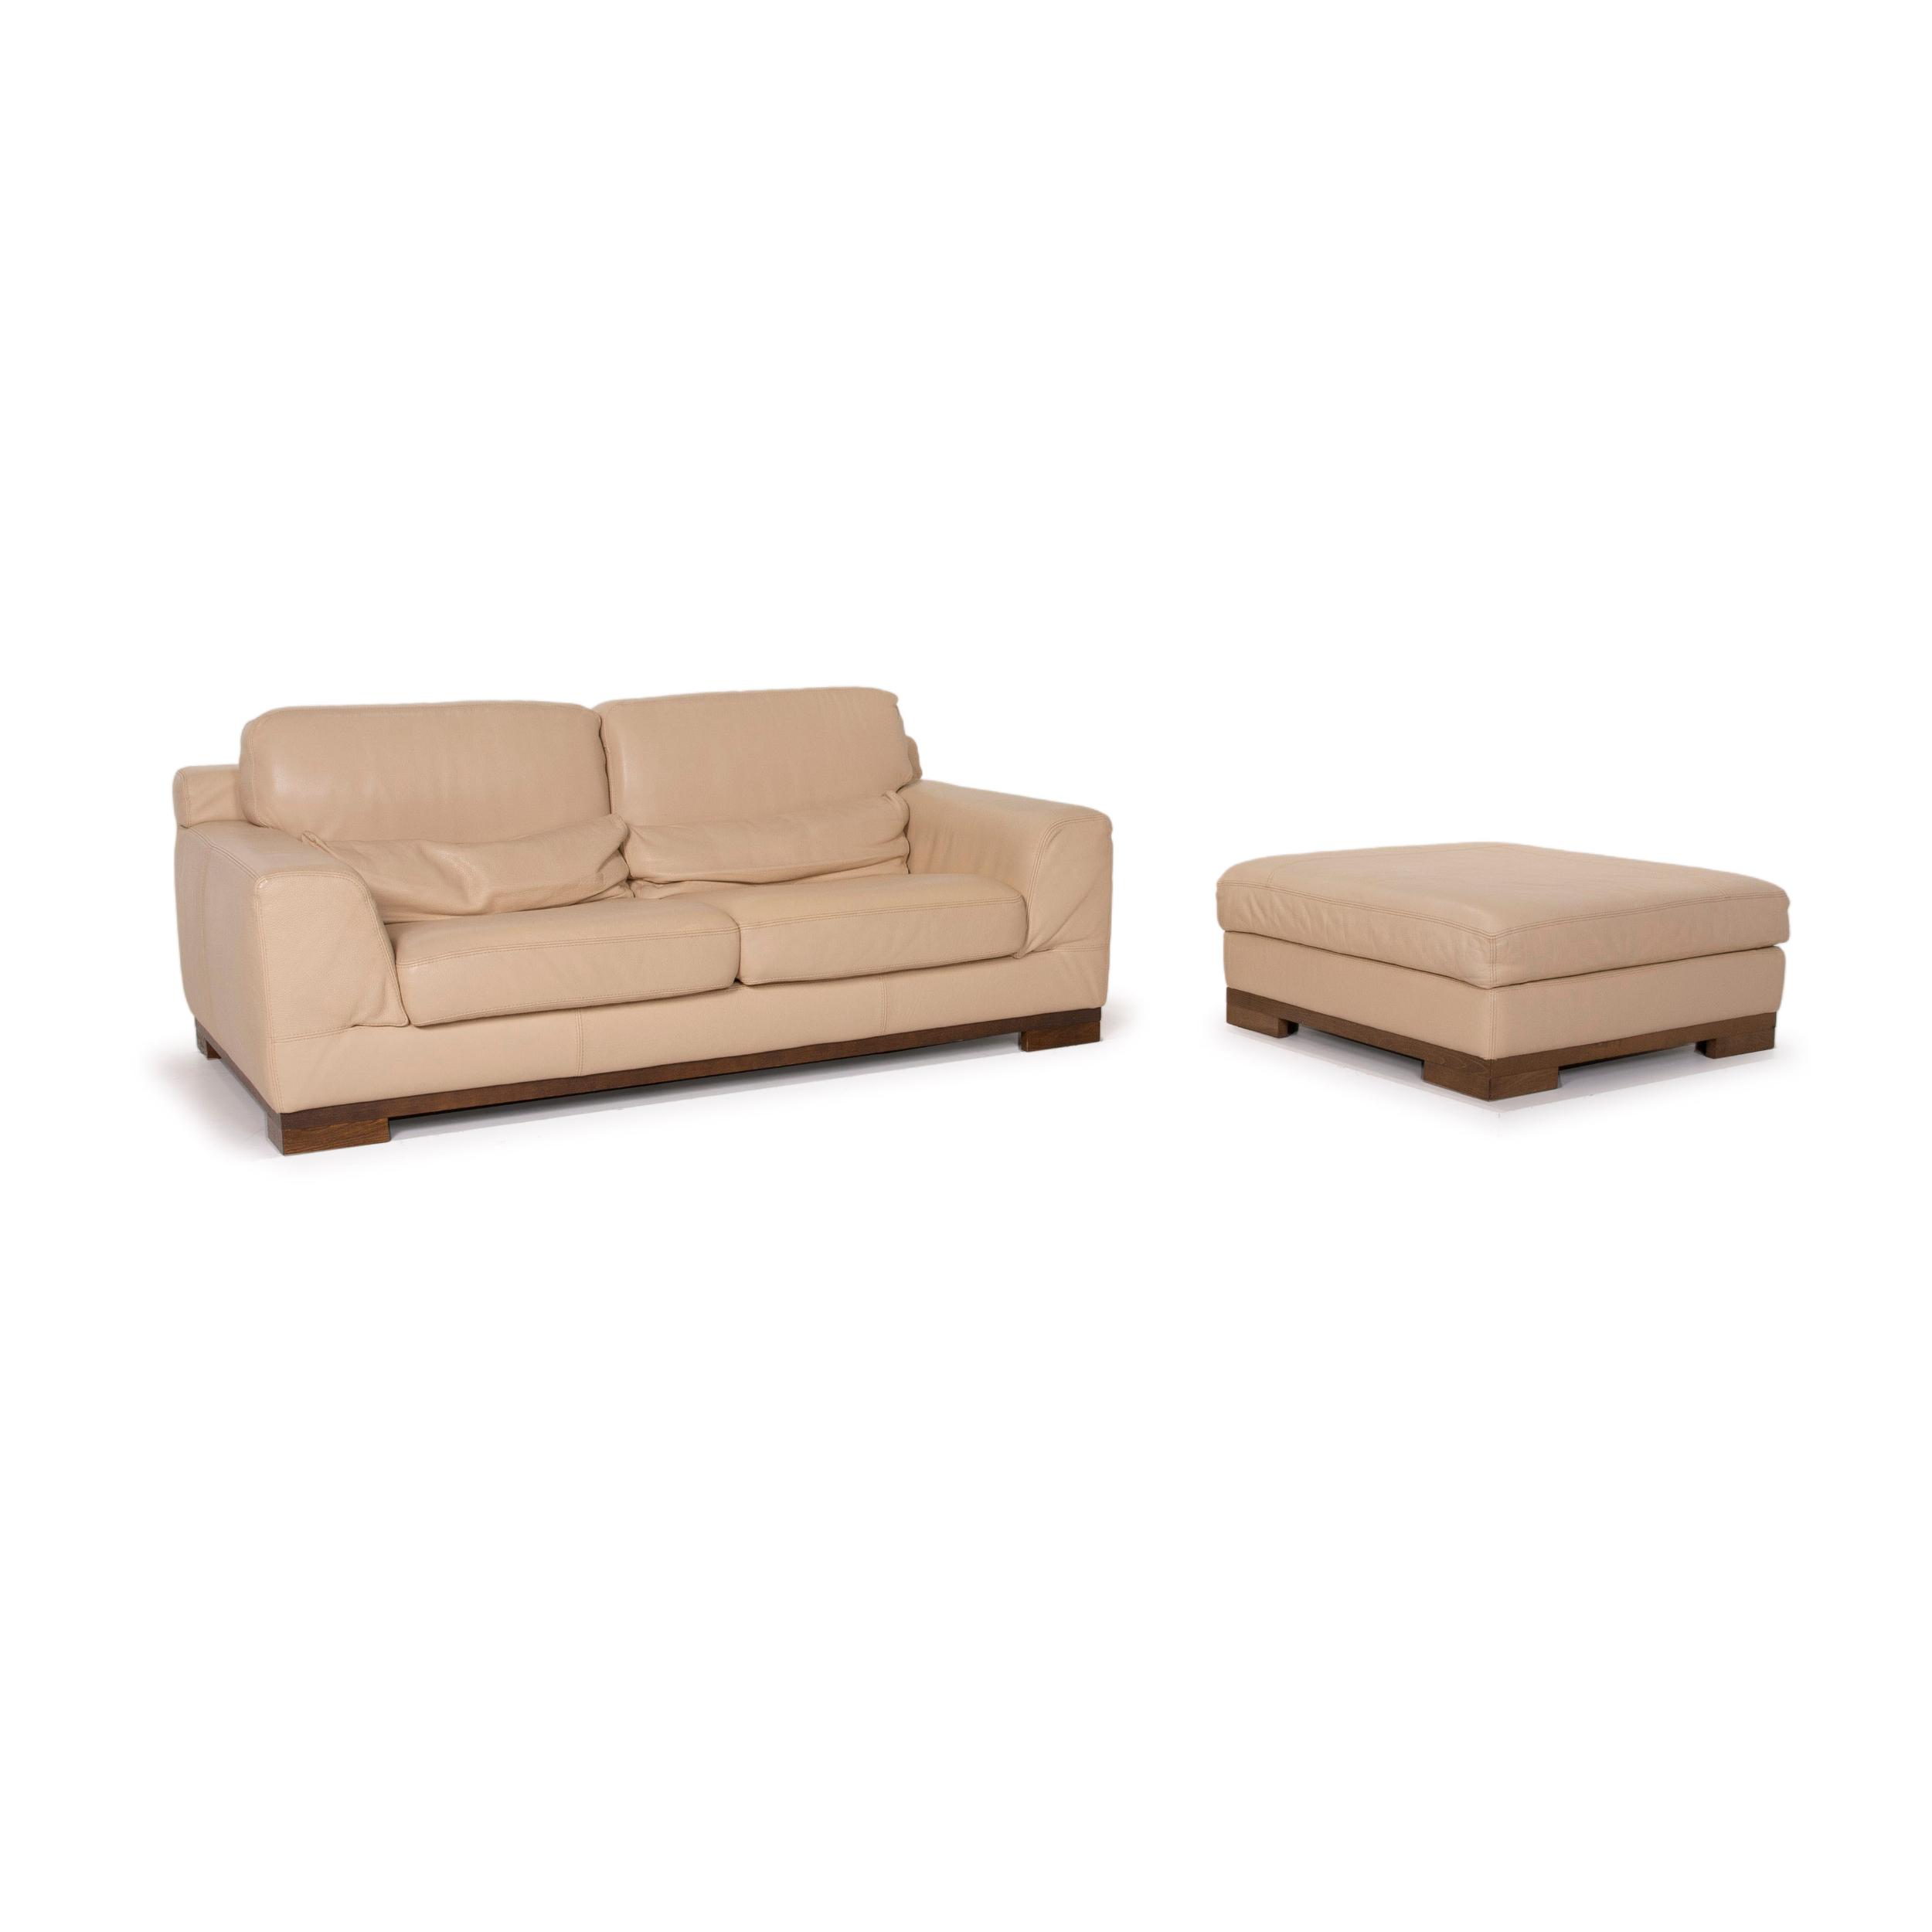 Natuzzi 12 Leather Sofa Set Beige Two Seater Ottoman 12